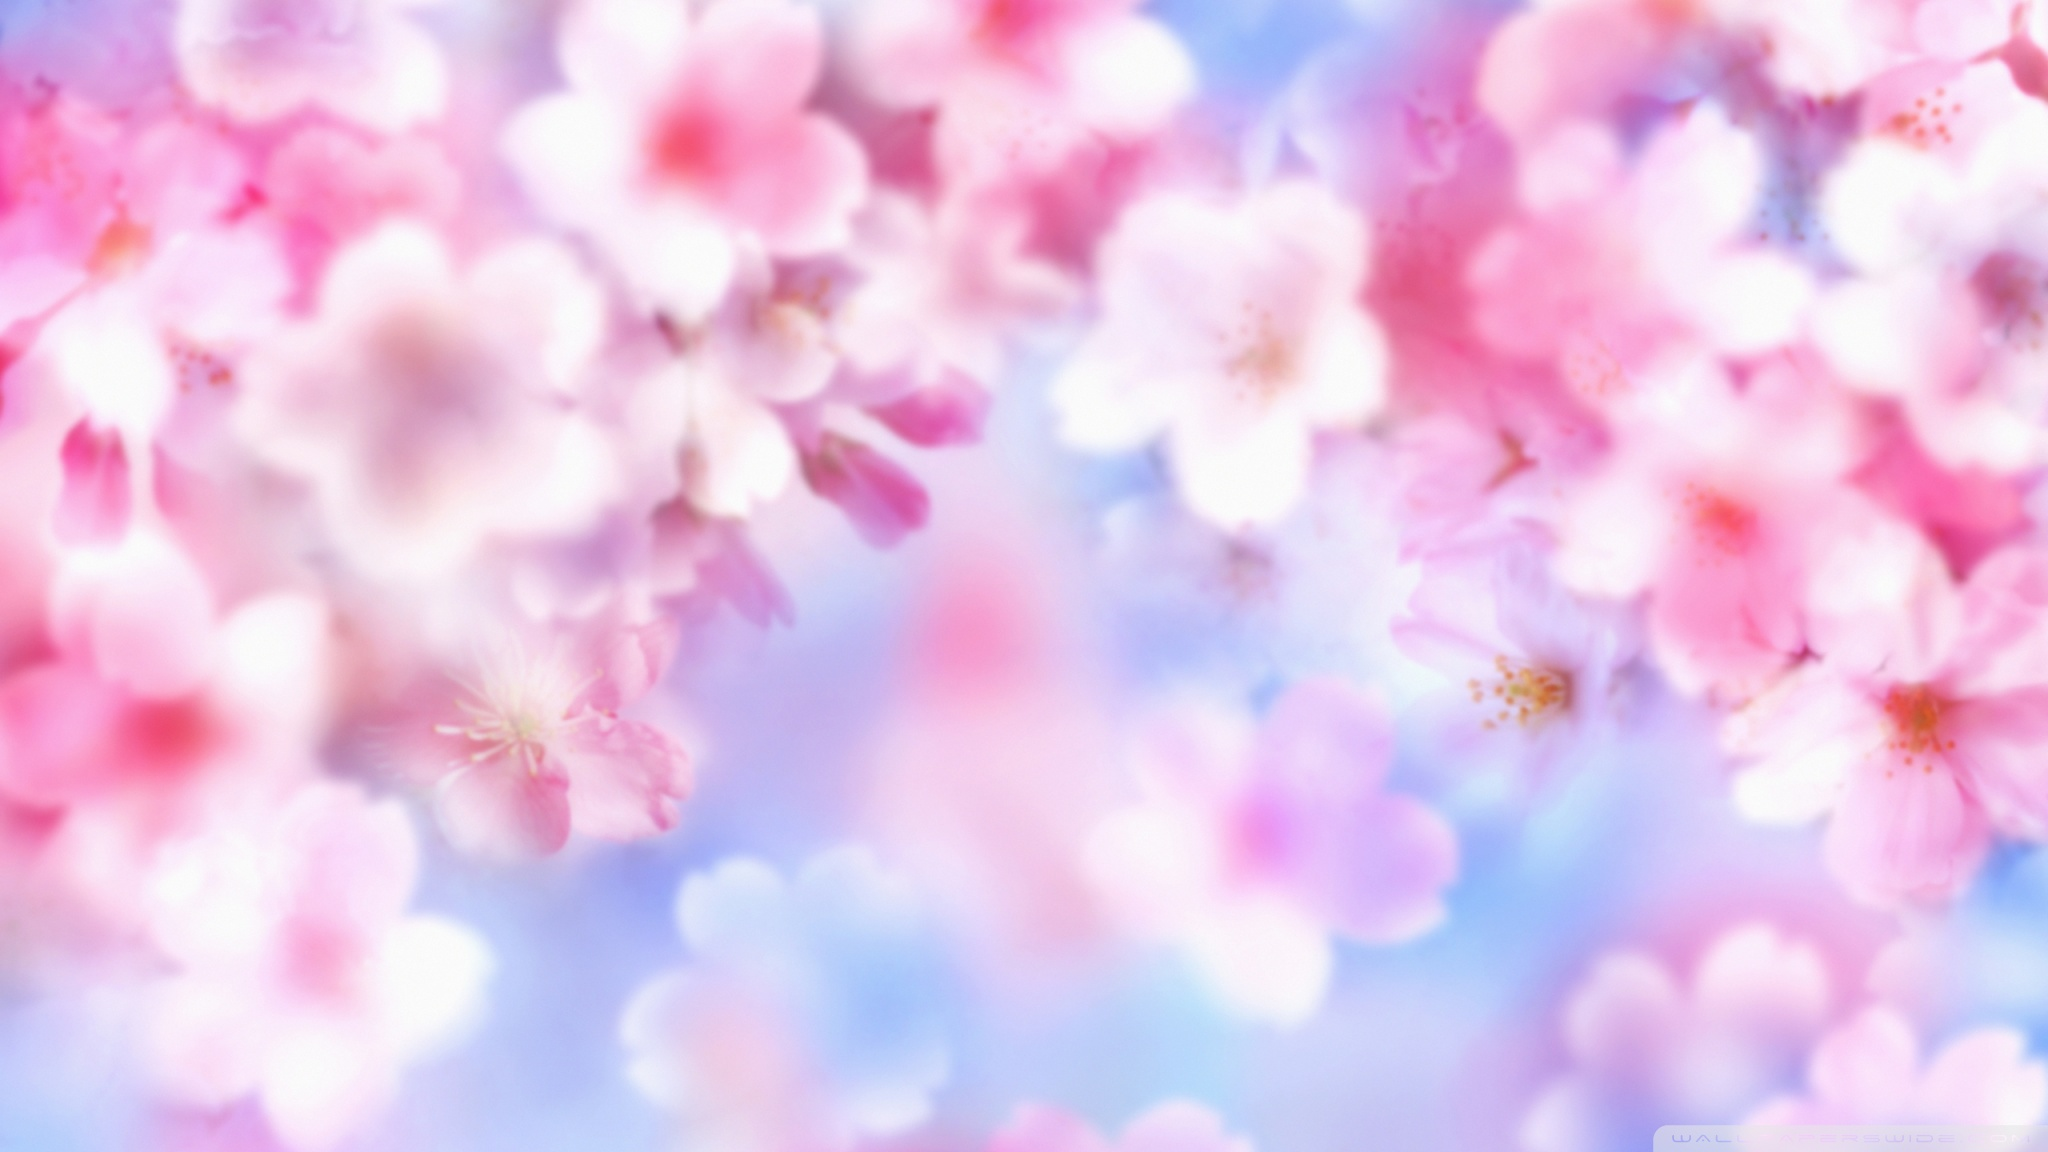 Pinterest Desktop Wallpaper Lotus Quote Pink Blossom Background 4k Hd Desktop Wallpaper For 4k